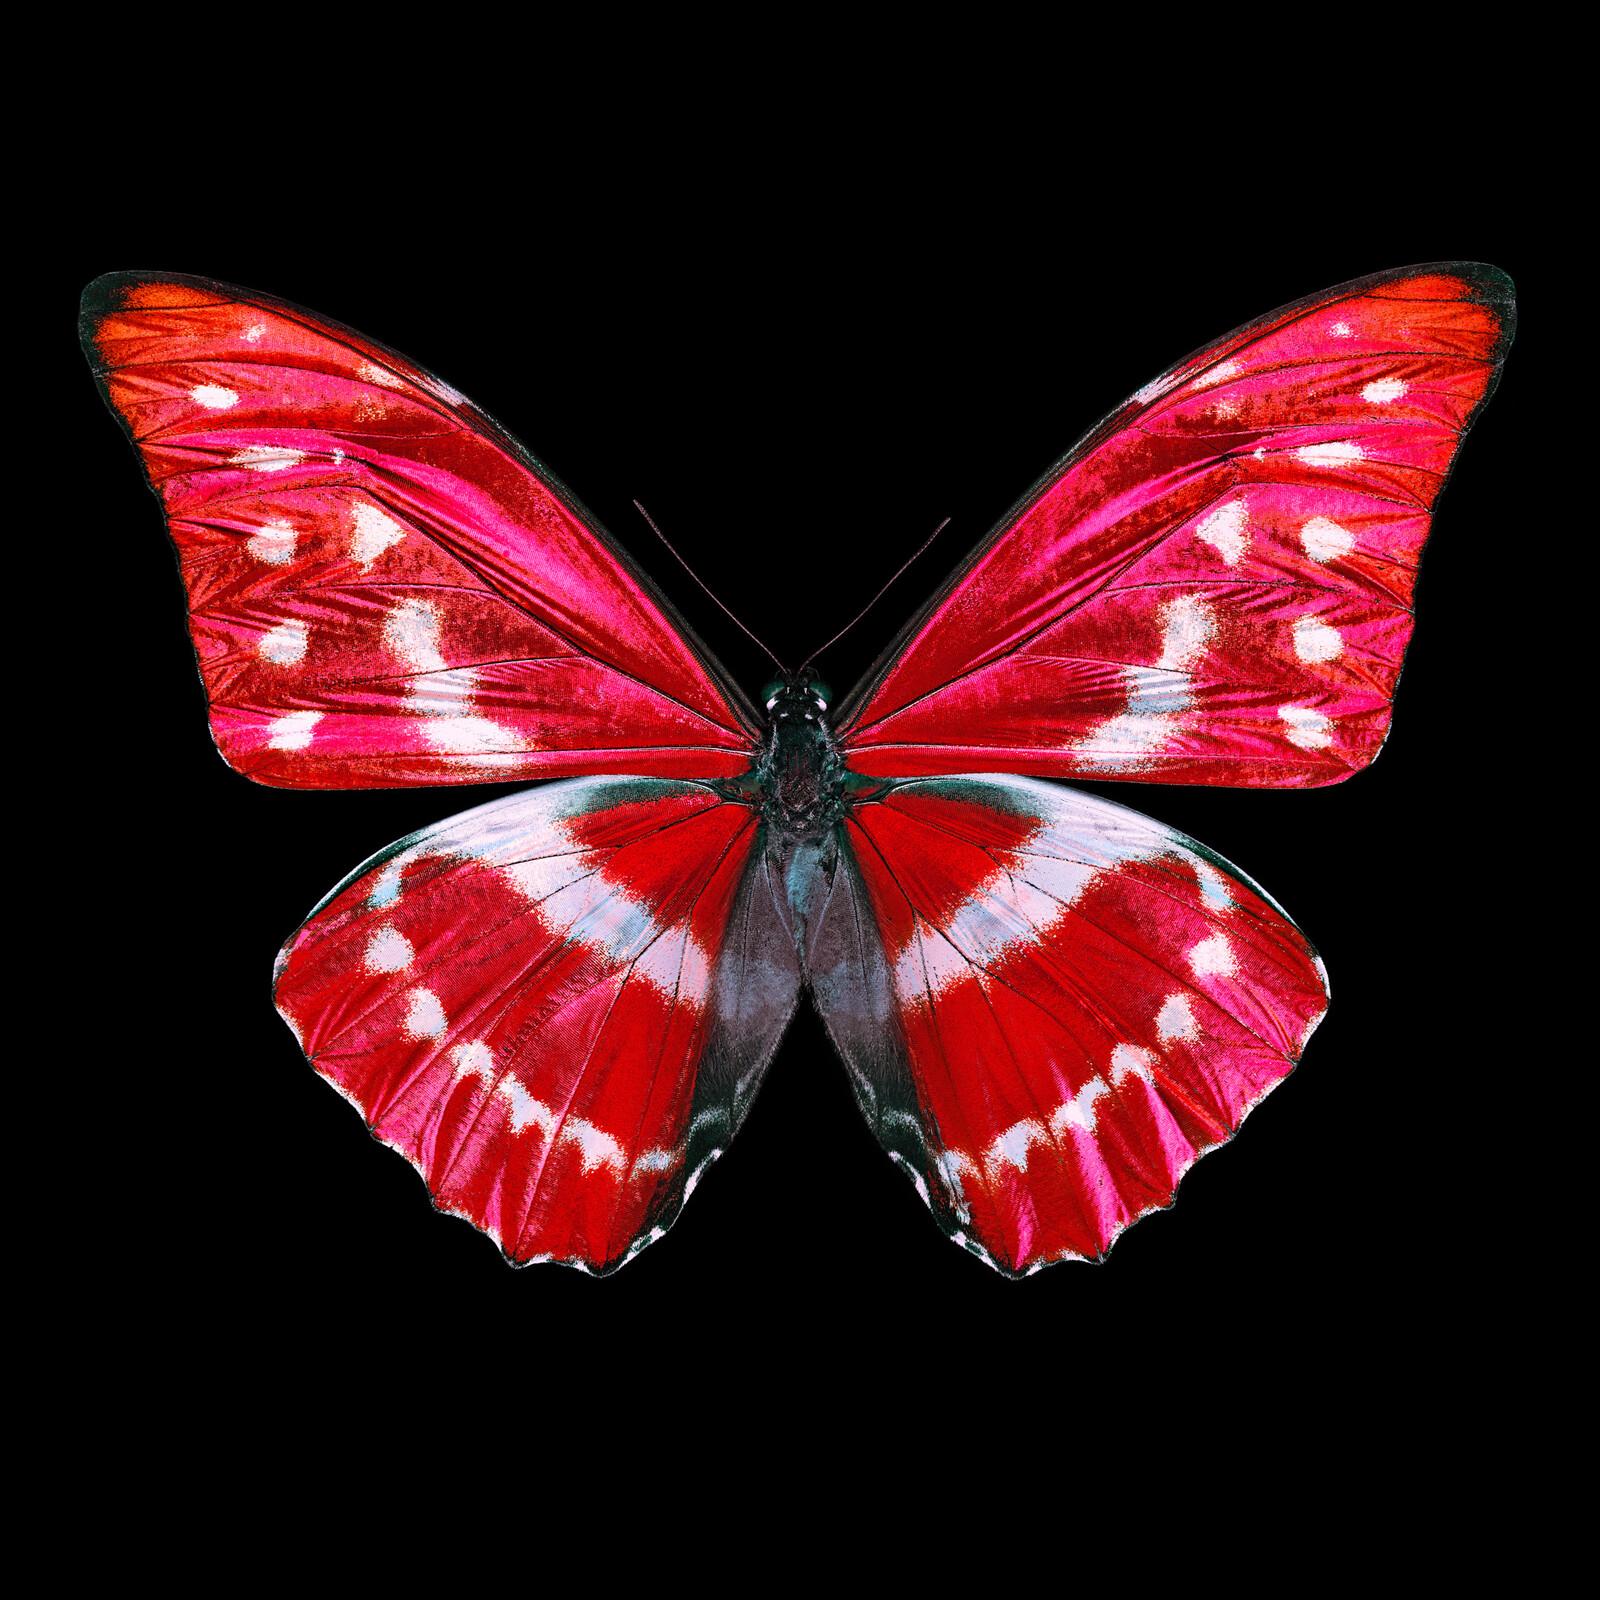 Butterfly X - Heiko Hellwig